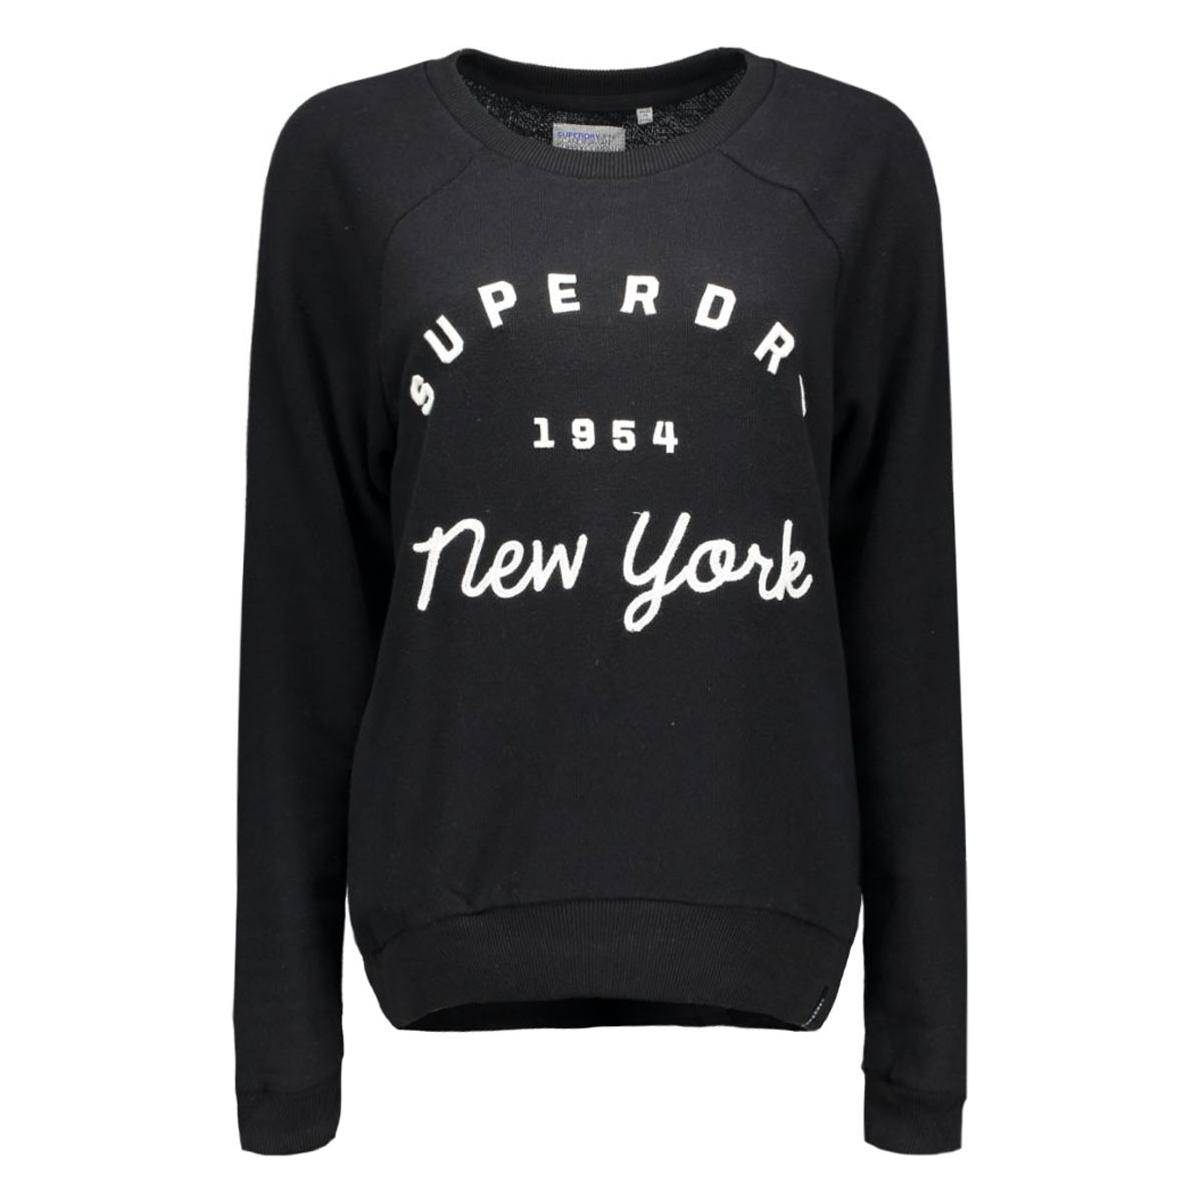 g20002pn applique raglan superdry sweater 02a black